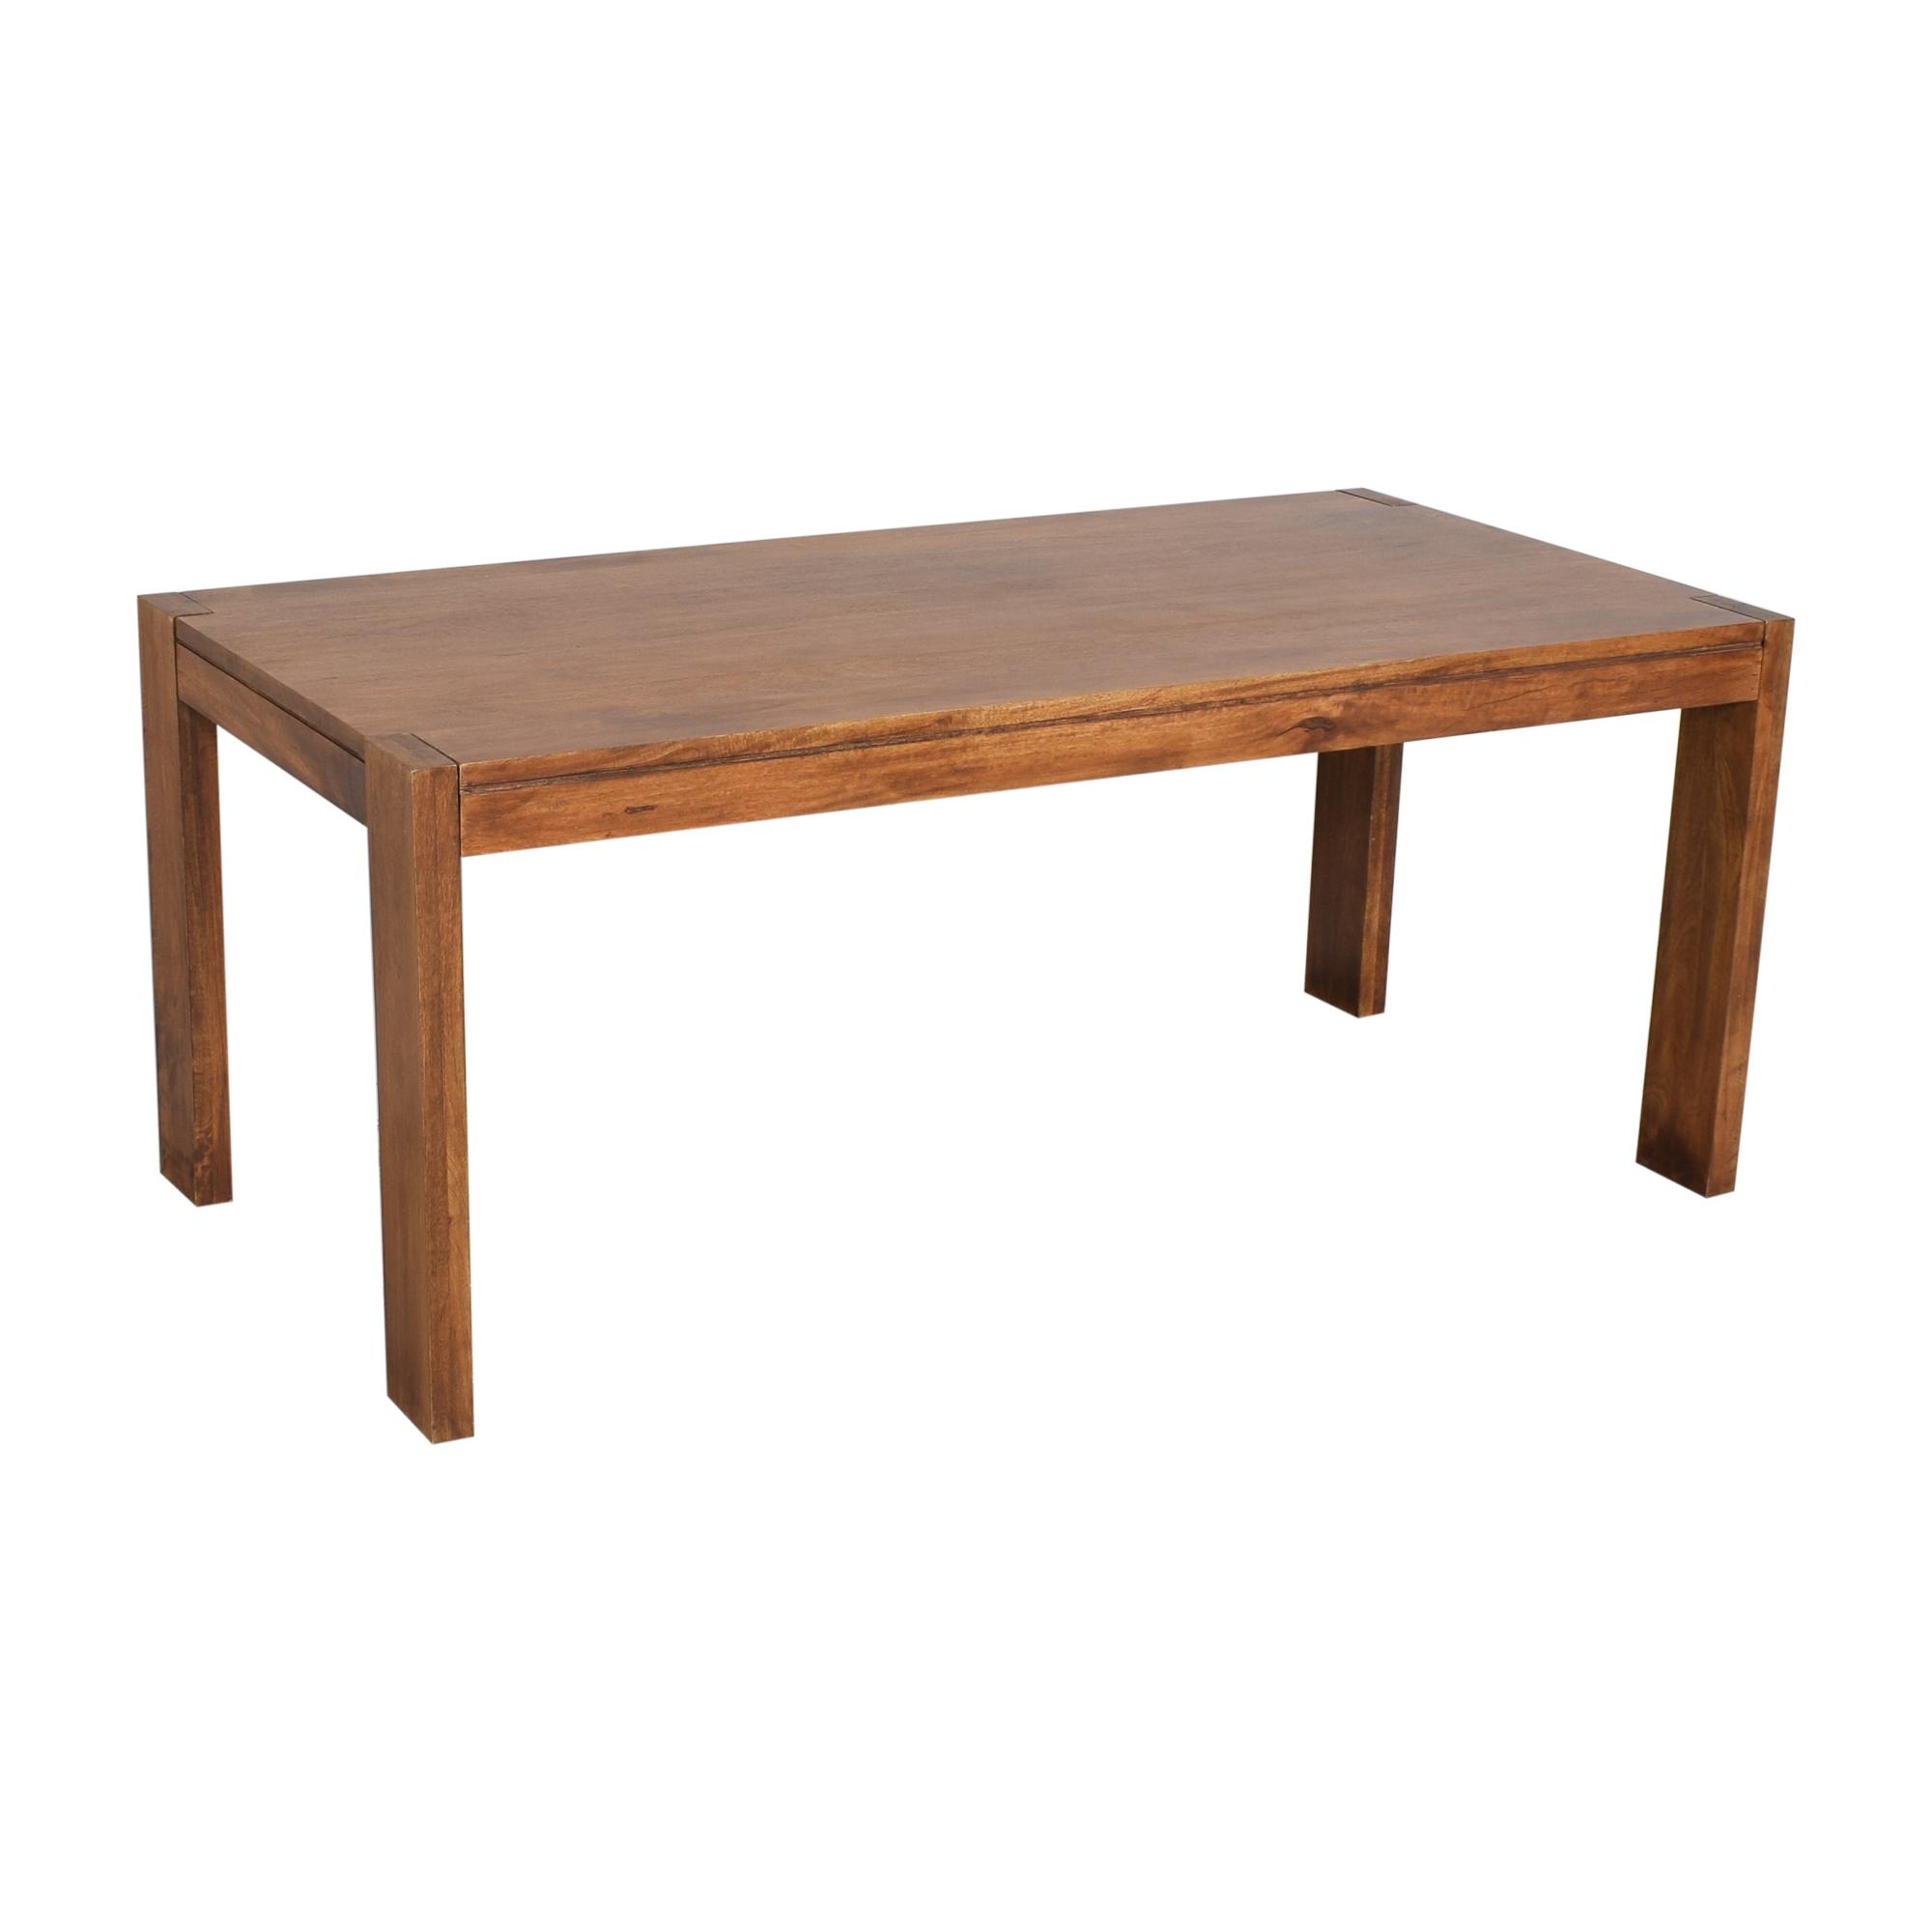 West Elm West Elm Boerum Dining Table dimensions